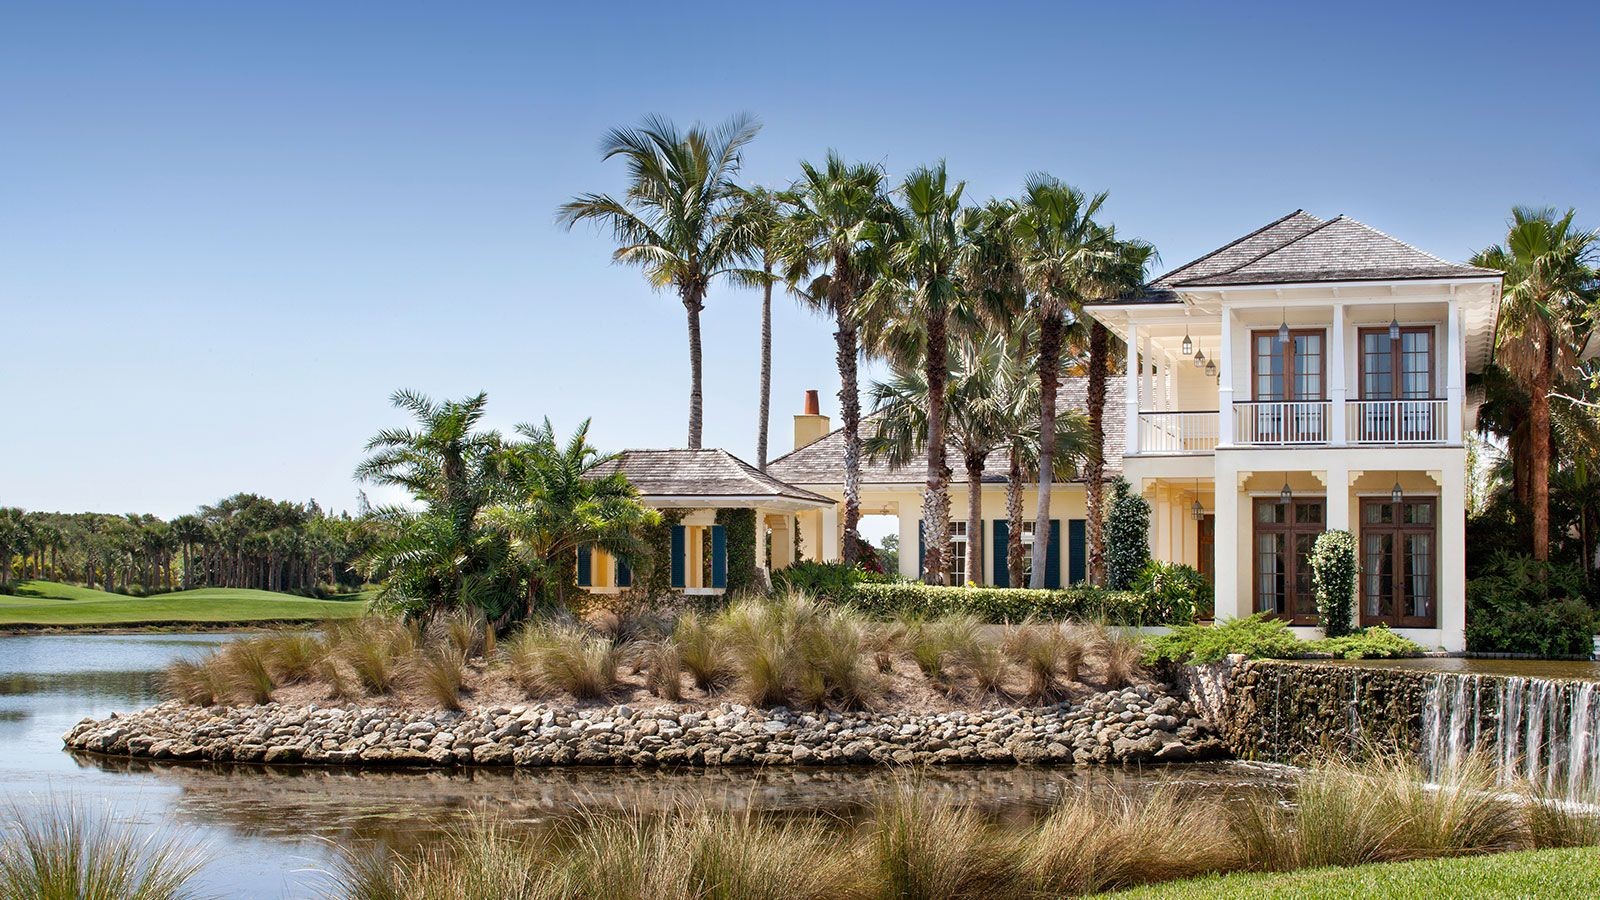 Luxury Residential Golf Real Estate Windsor Vero Beach Florida Vero Beach Waterfront Property Vero Beach Florida